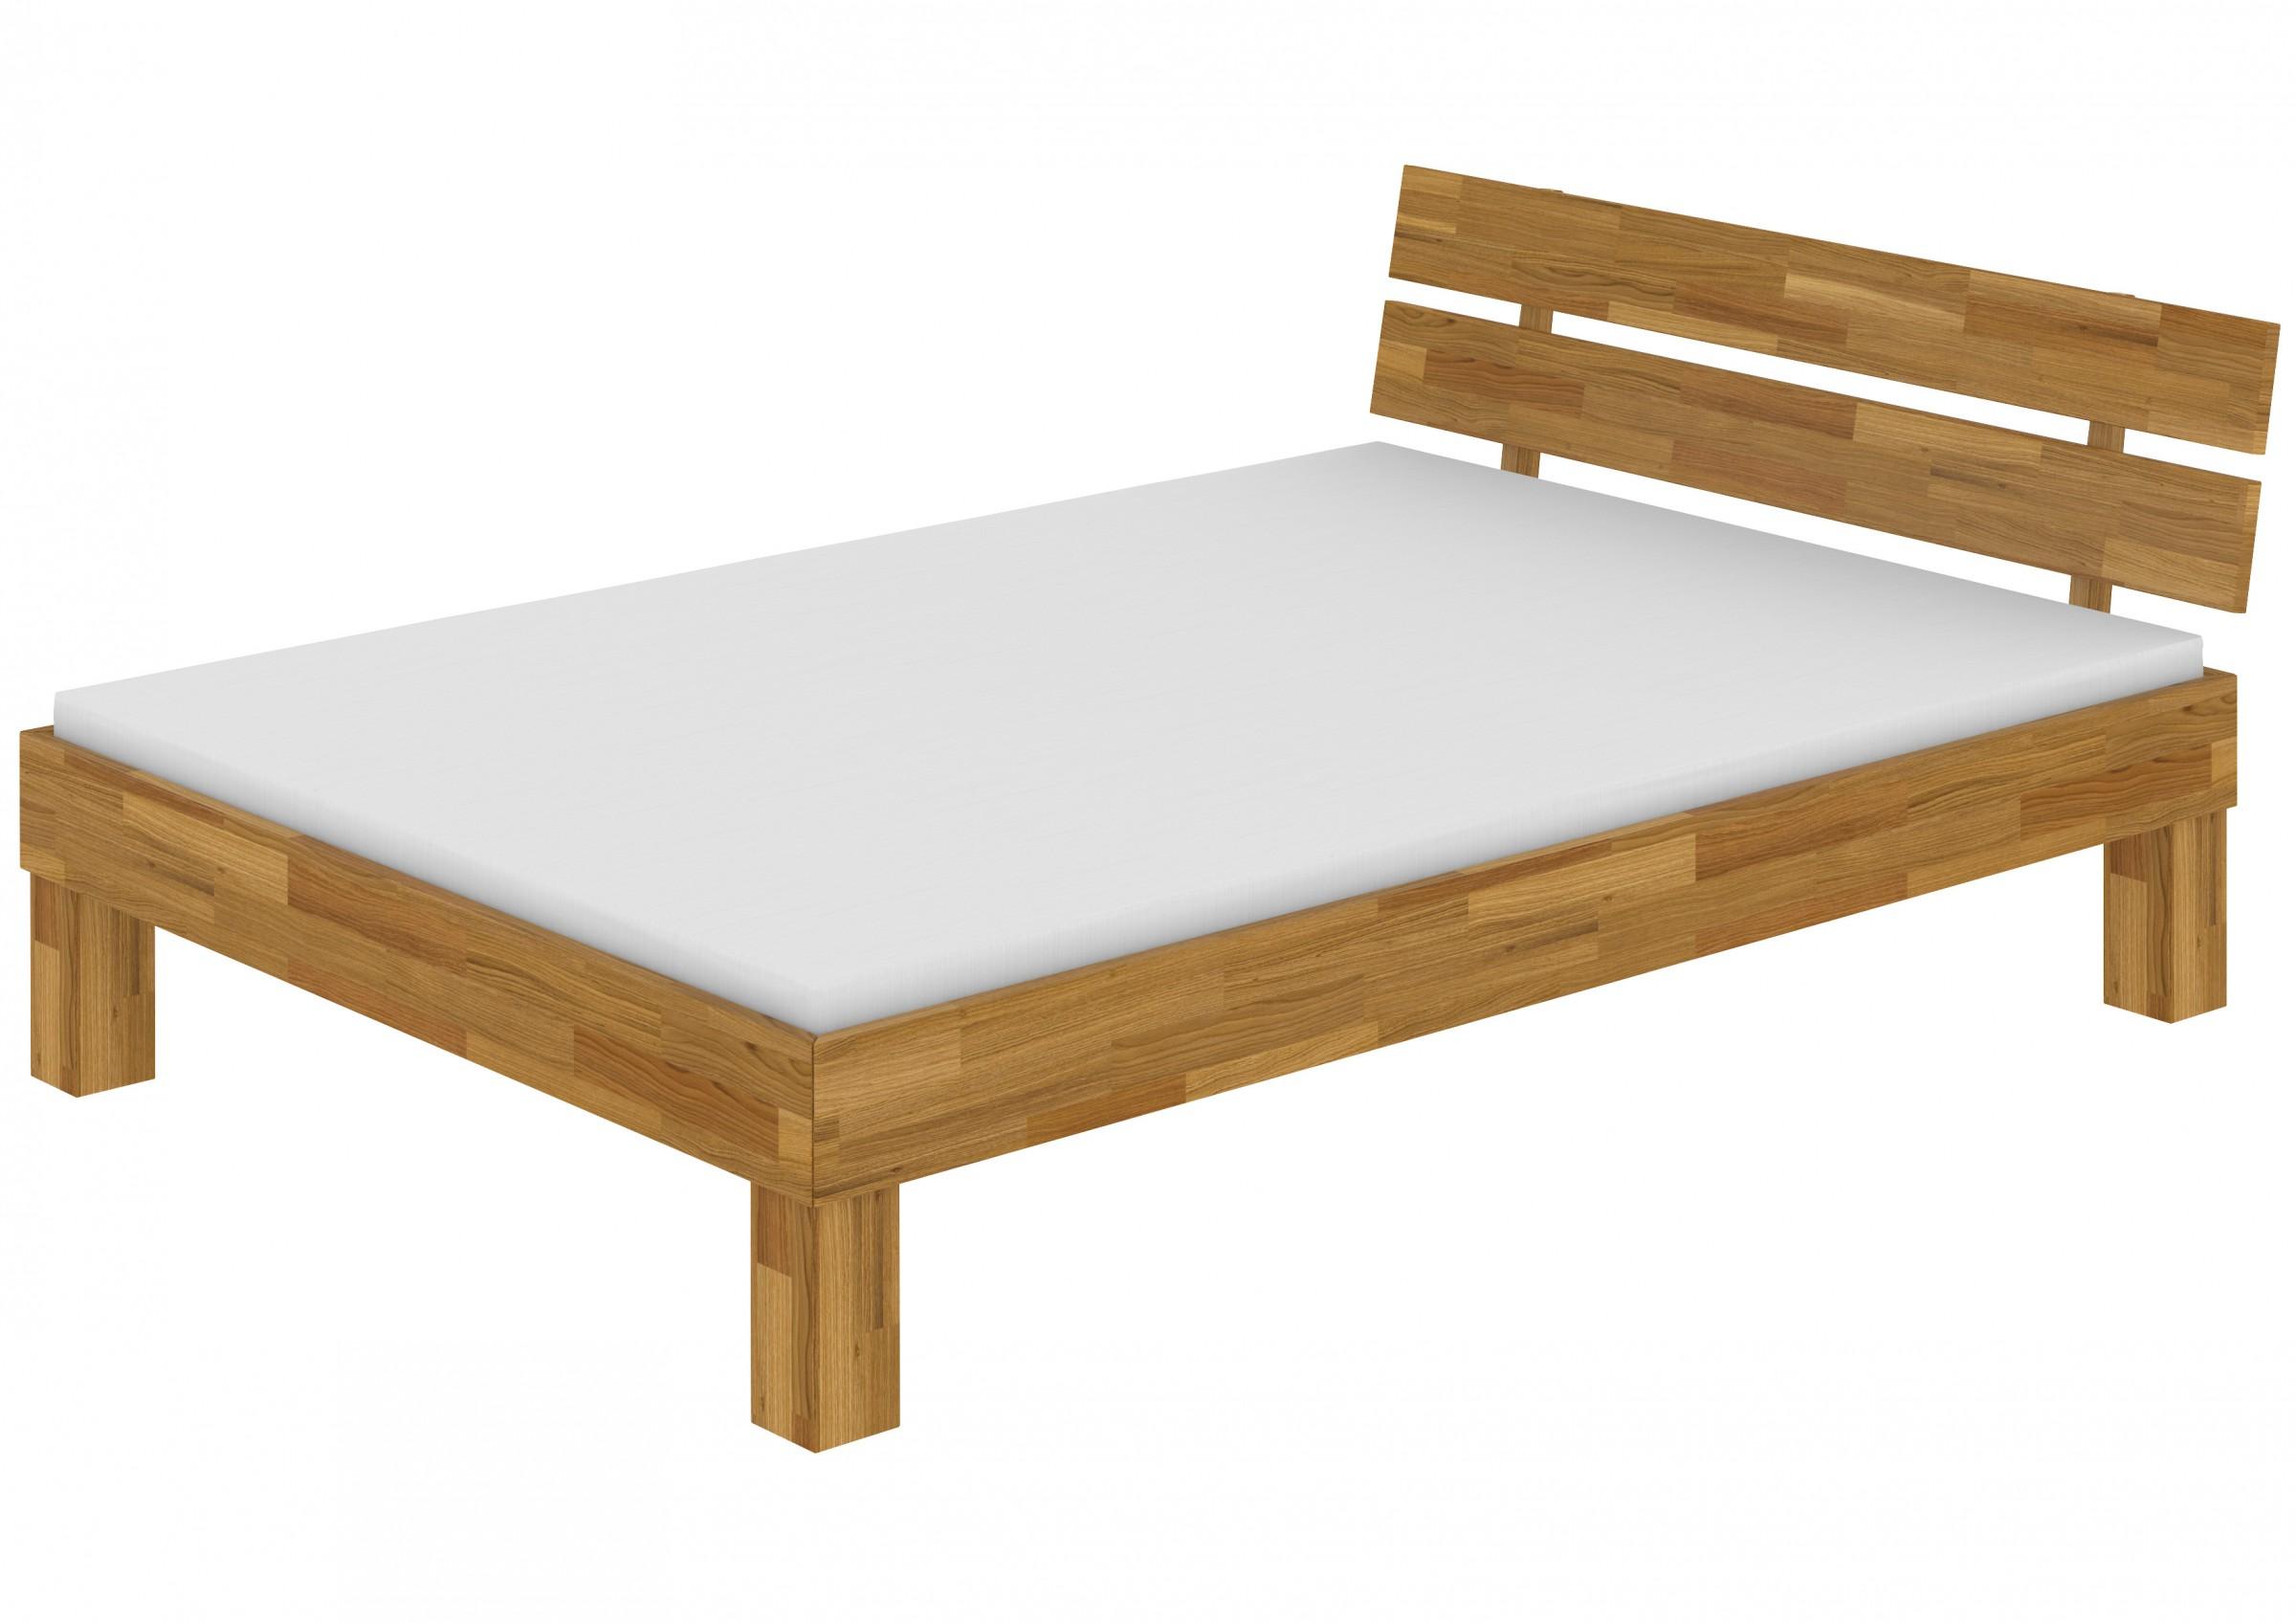 fs m bett 140x200 eiche massiv doppelbett federholzrahmen u matratze ebay. Black Bedroom Furniture Sets. Home Design Ideas